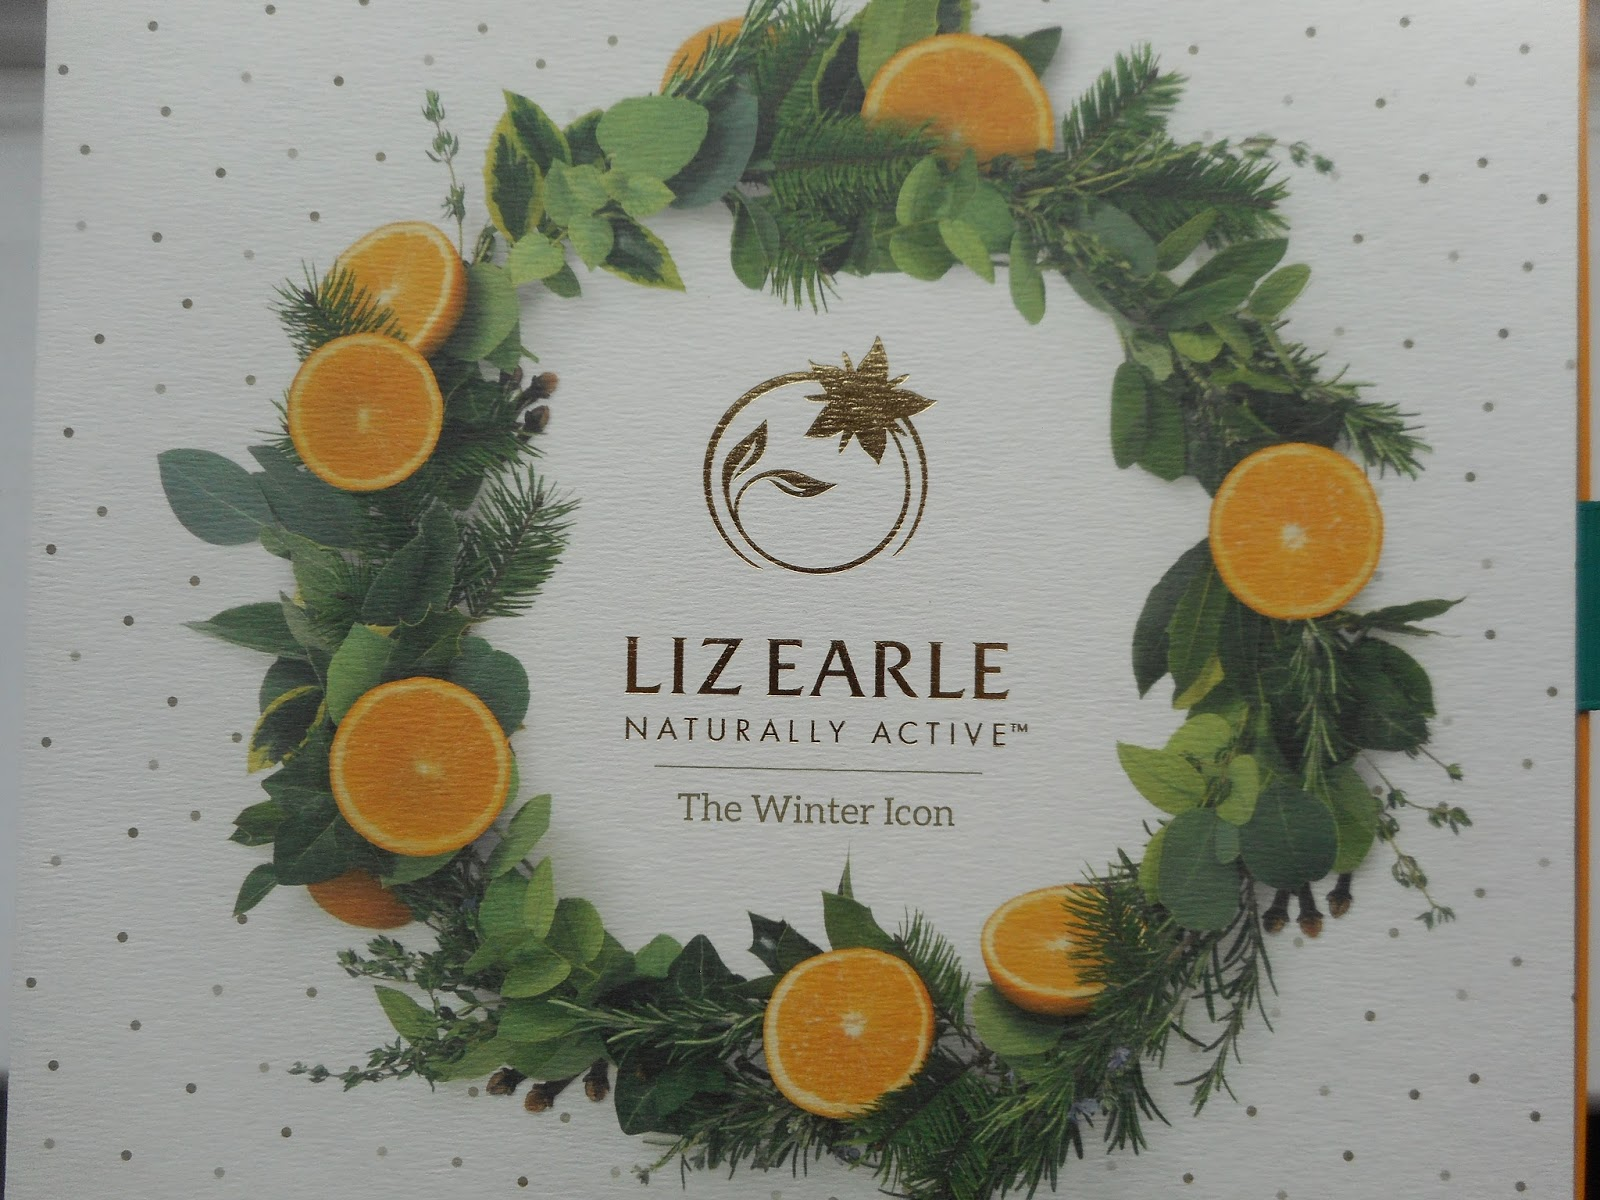 http://sophaarambles.blogspot.co.uk/2017/01/liz-earle-sweet-orange-clove-cleanse.html